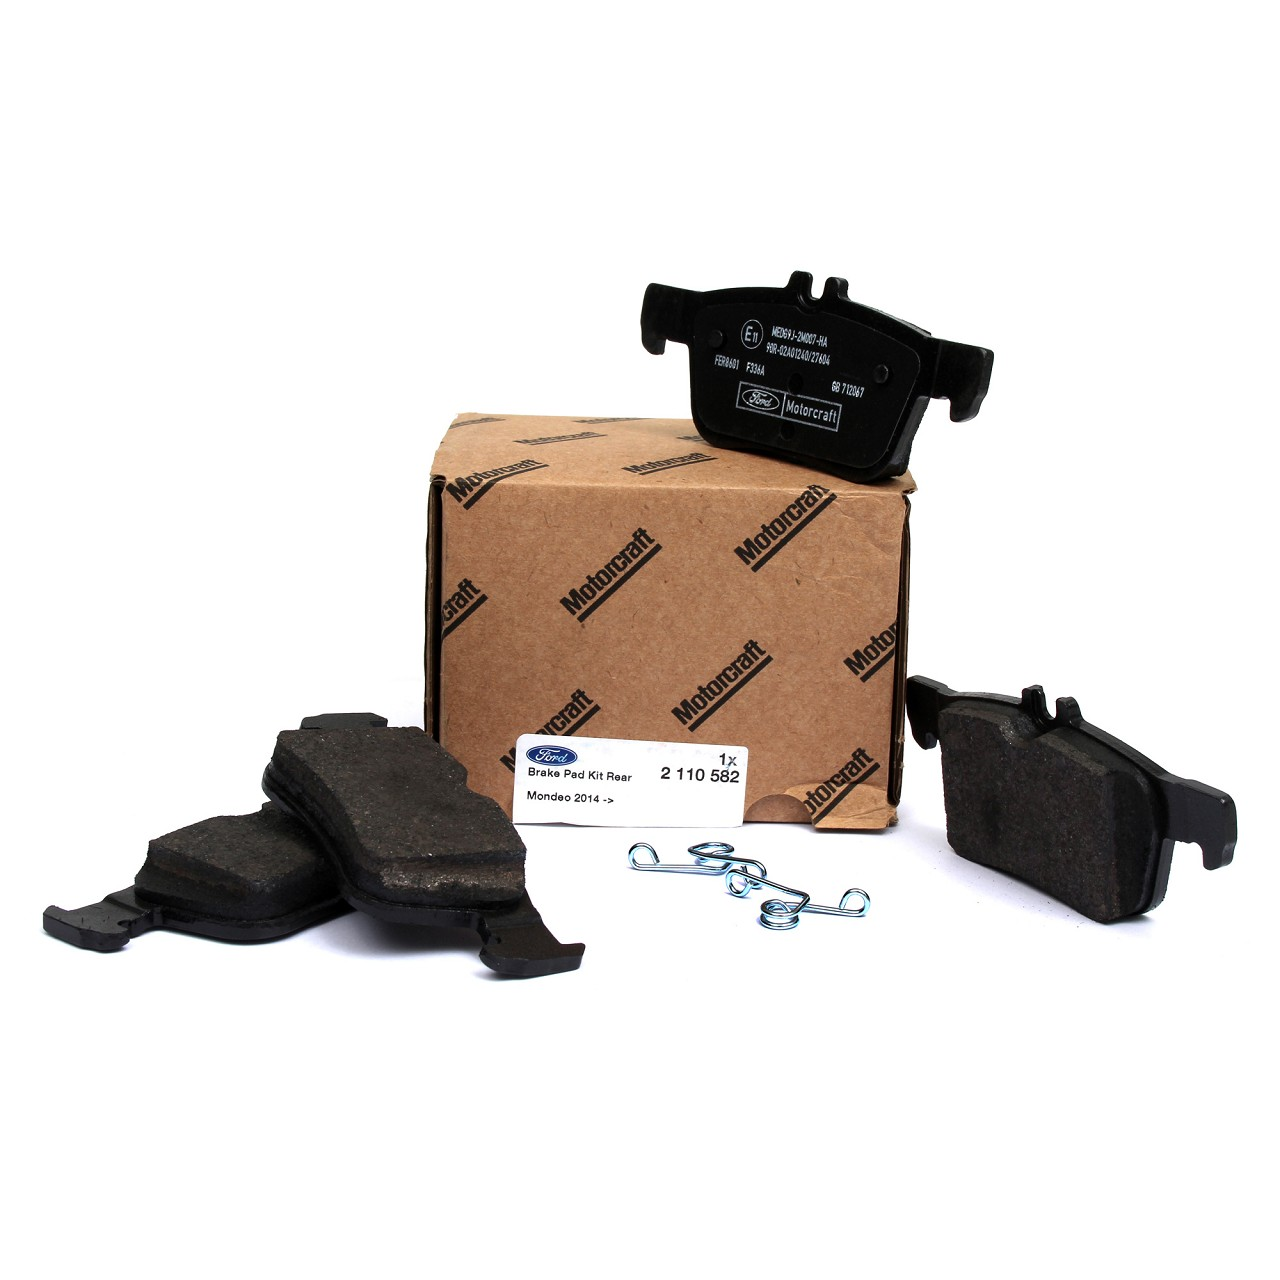 ORIGINAL Ford Bremsbeläge MONDEO V MK5 16 Zoll ab 05.2015 hinten 2110582